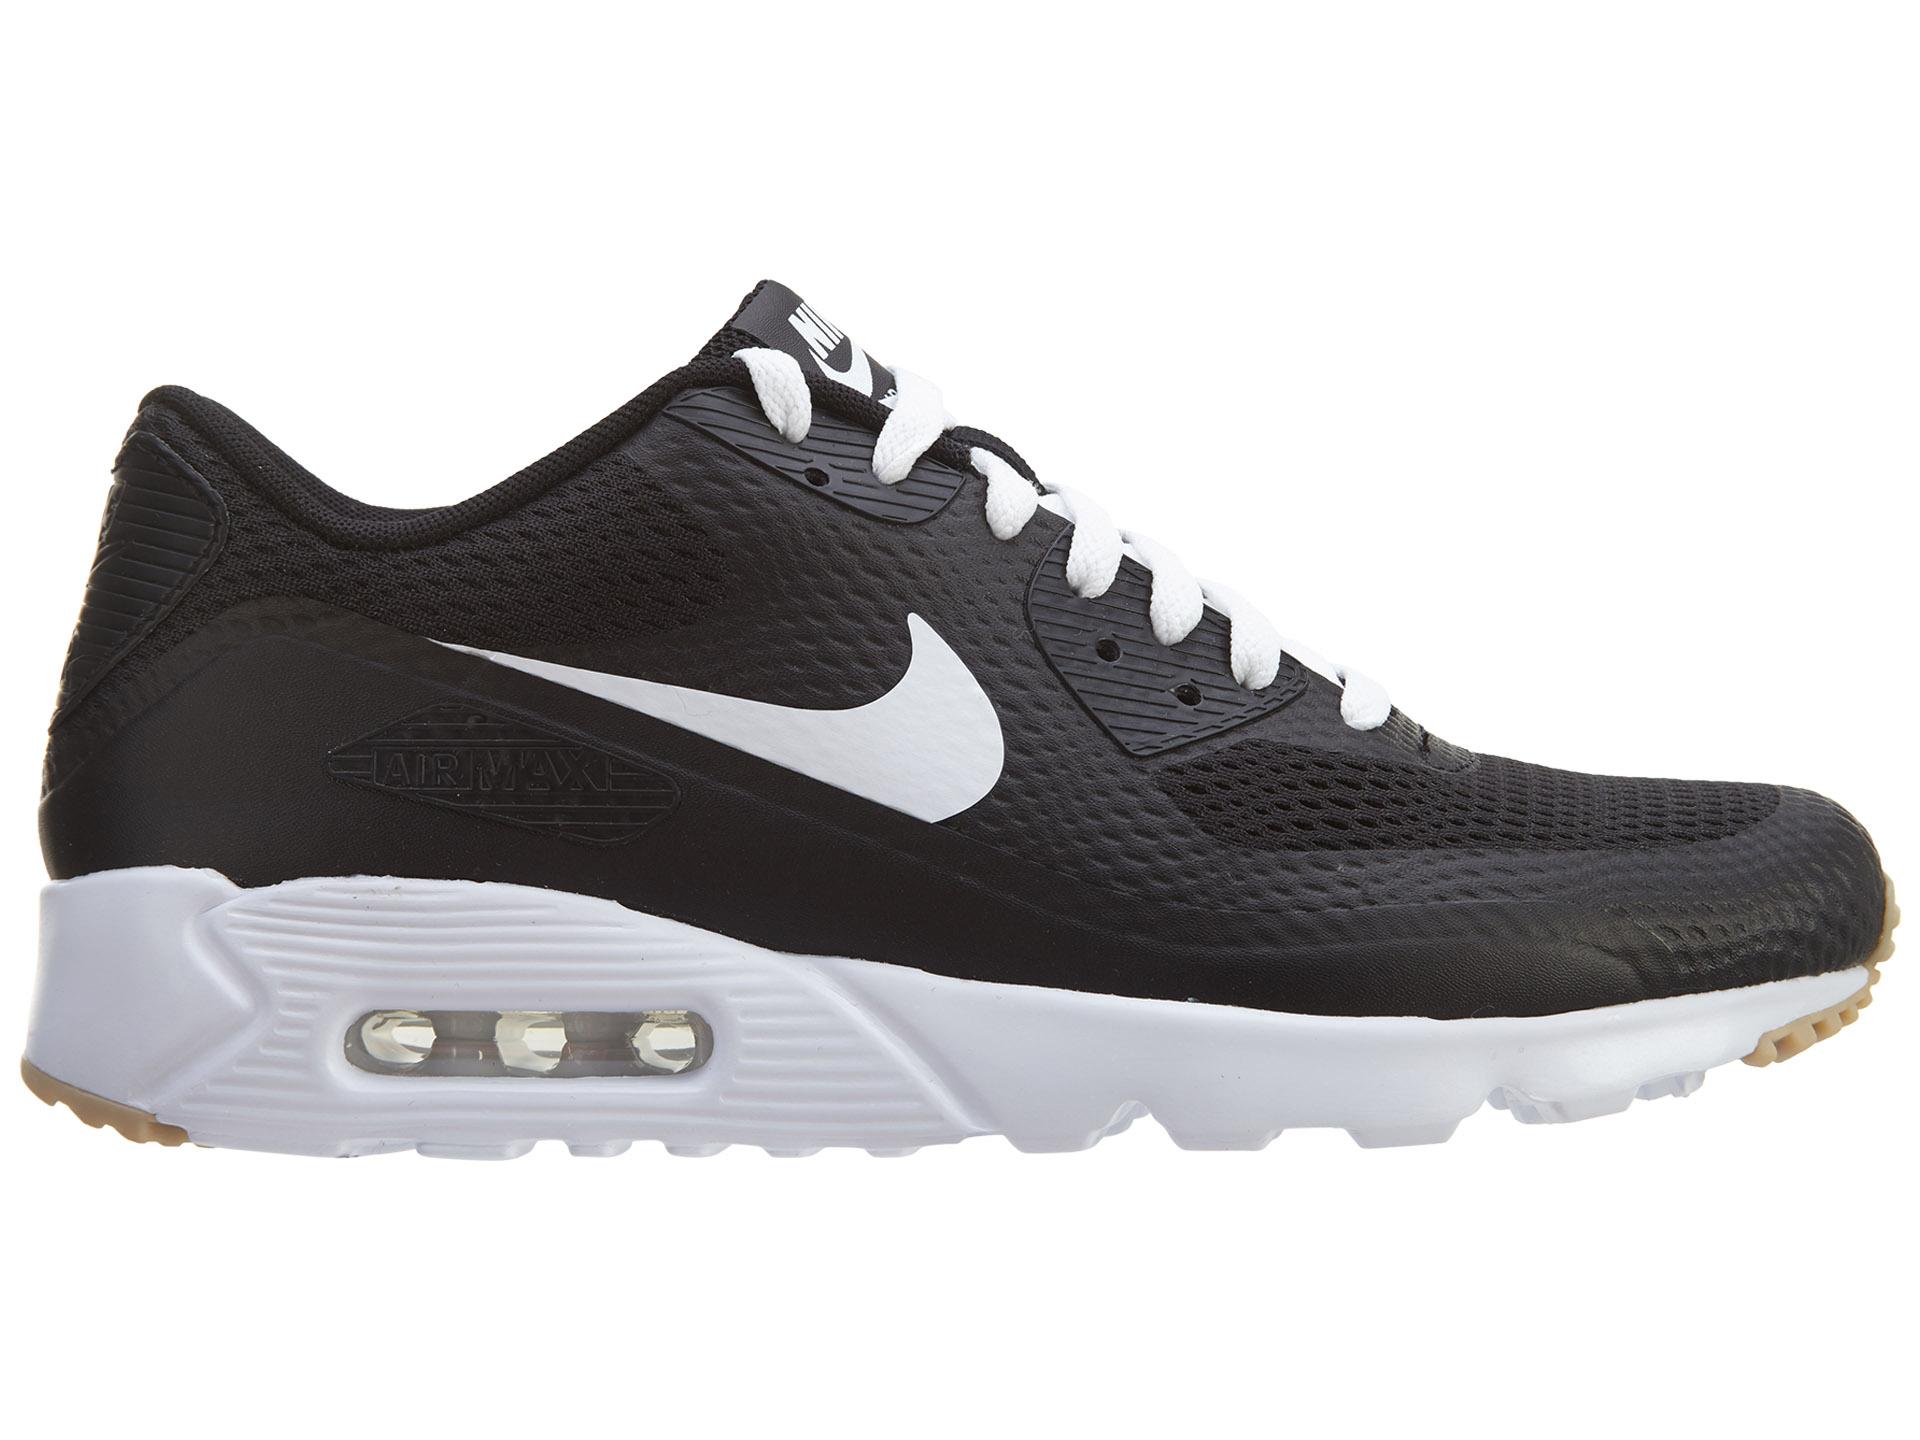 Nike Air Max 90 Ultra Essential Black White-Black